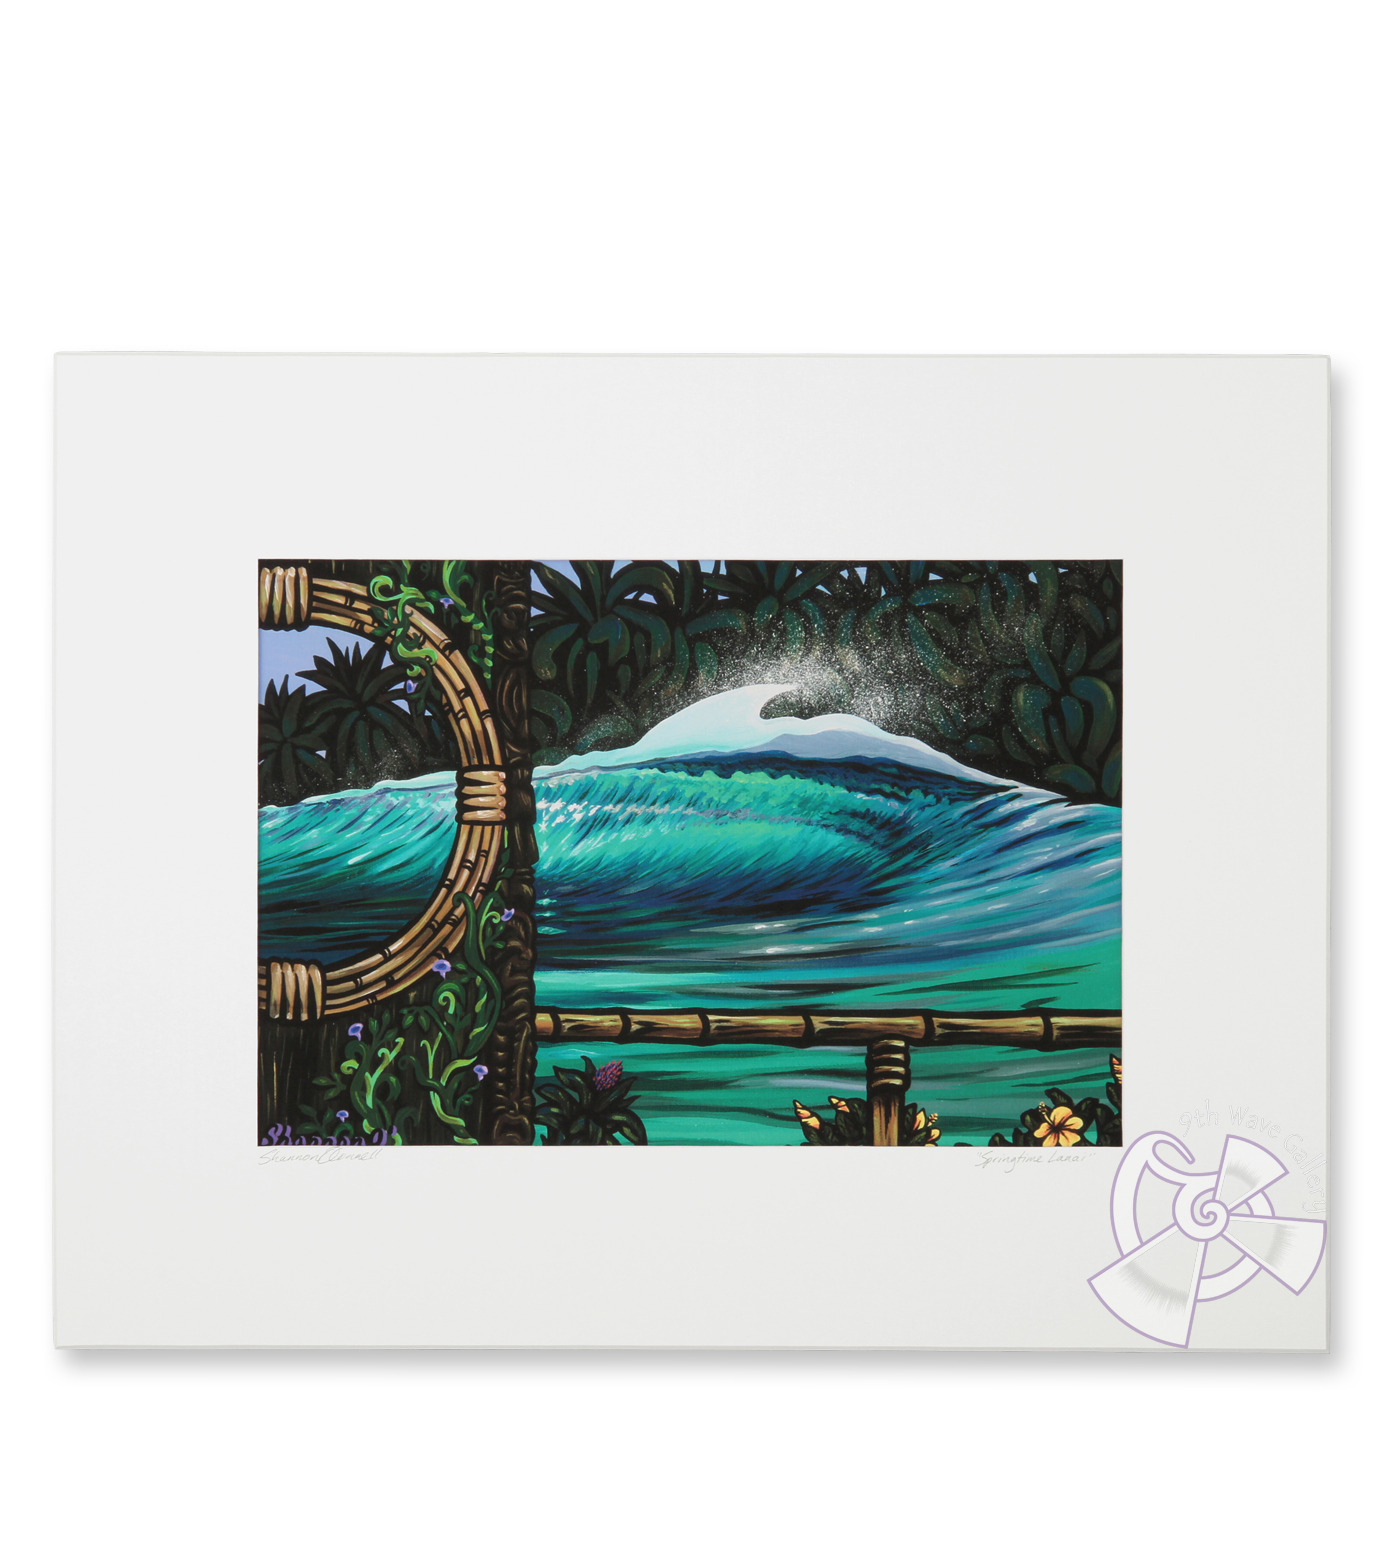 9th Wave Gallery(9th ウェイブ ギャラリー)のSpringtime lanai print M-NONE-S-Pr-Spring-0 拡大詳細画像1